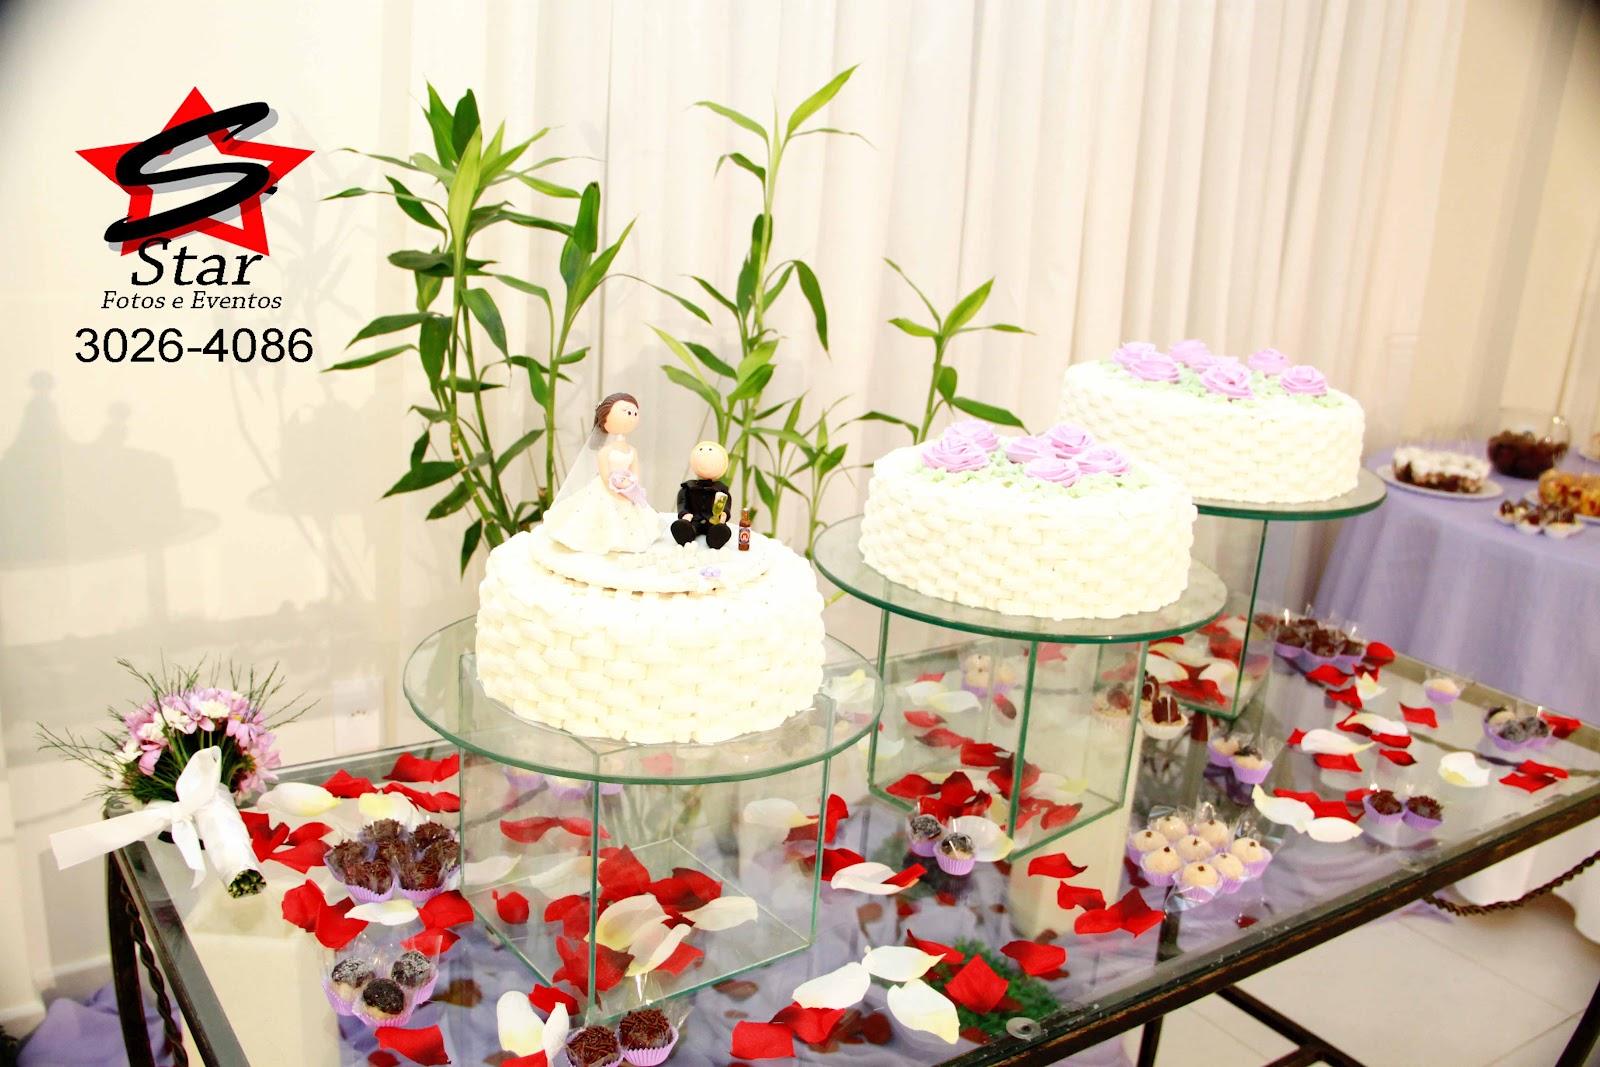 decoracao de interiores joinville : decoracao de interiores joinville:jpeg, para casamento em joinville decoração para bodas em joinville